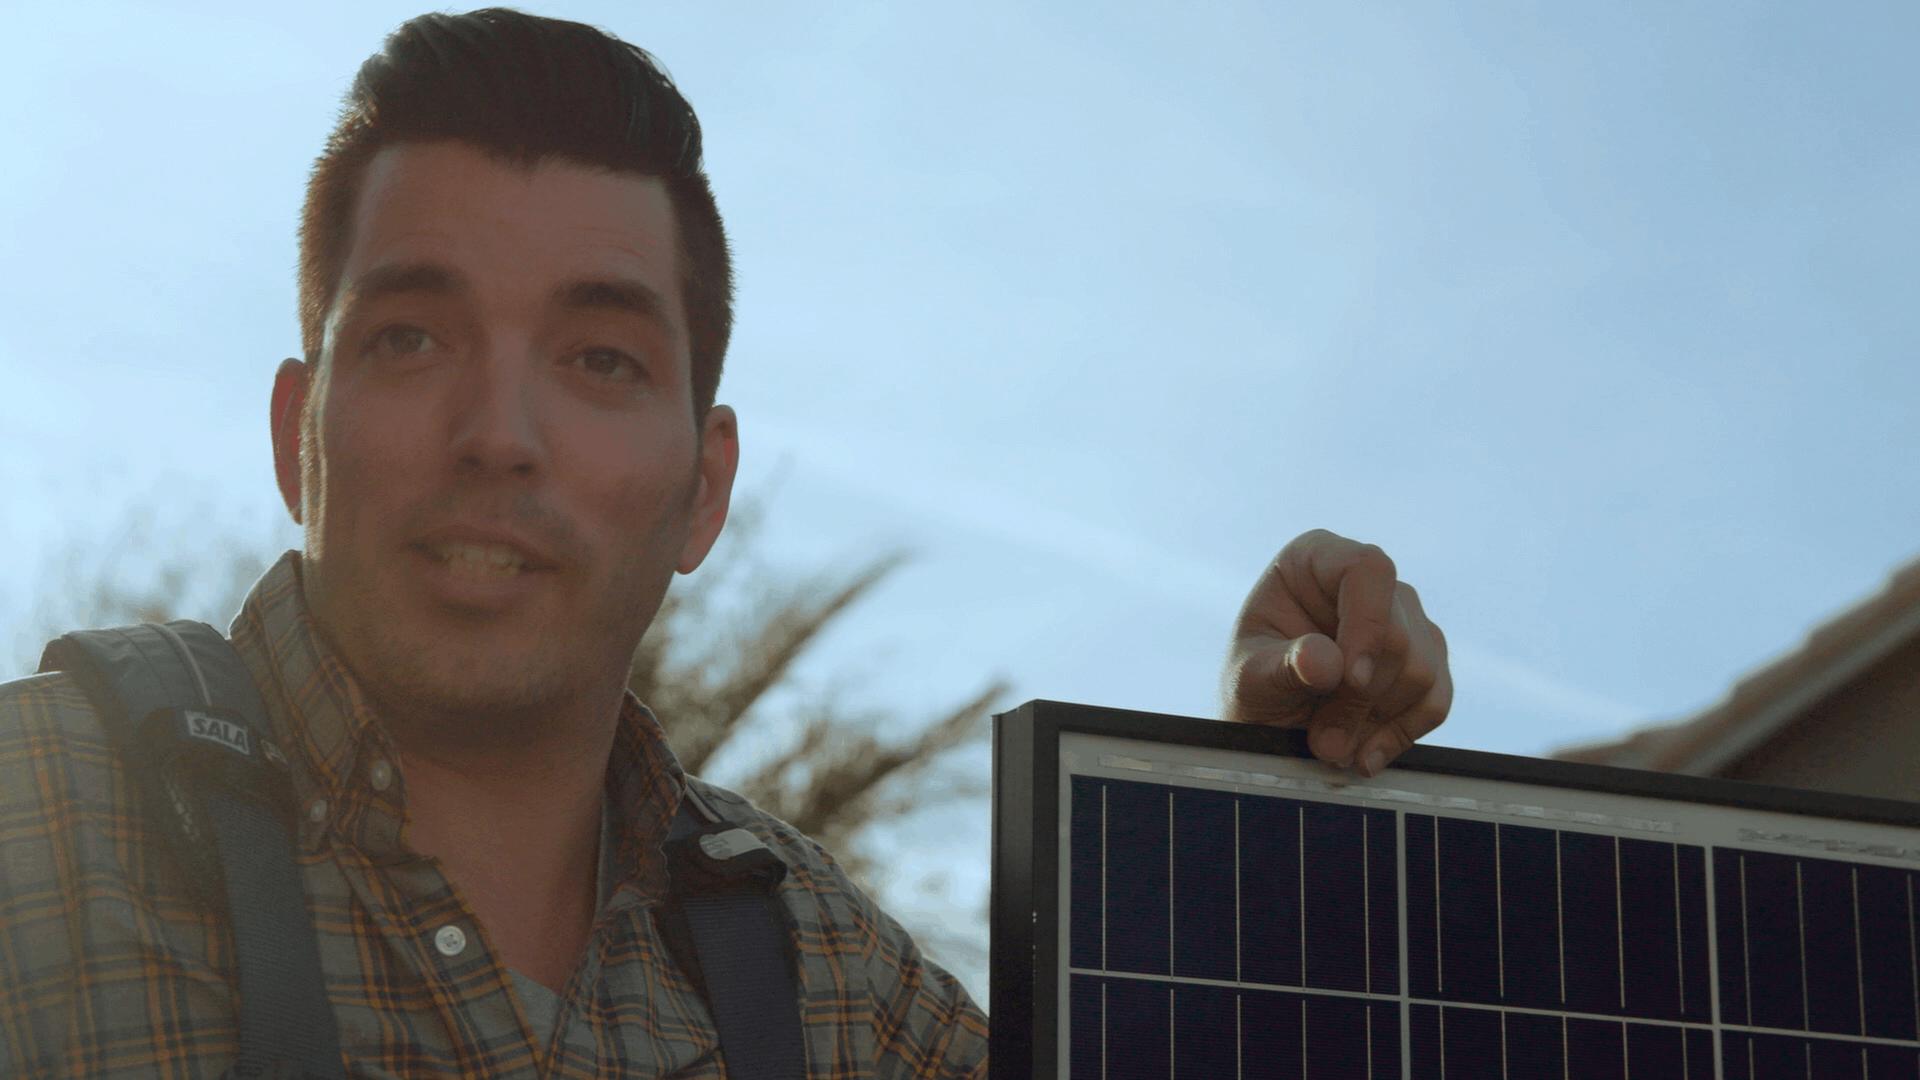 Jonathan Scott's Power Trip (2020) [Must-Watch Energy Suppression Documentary] 9